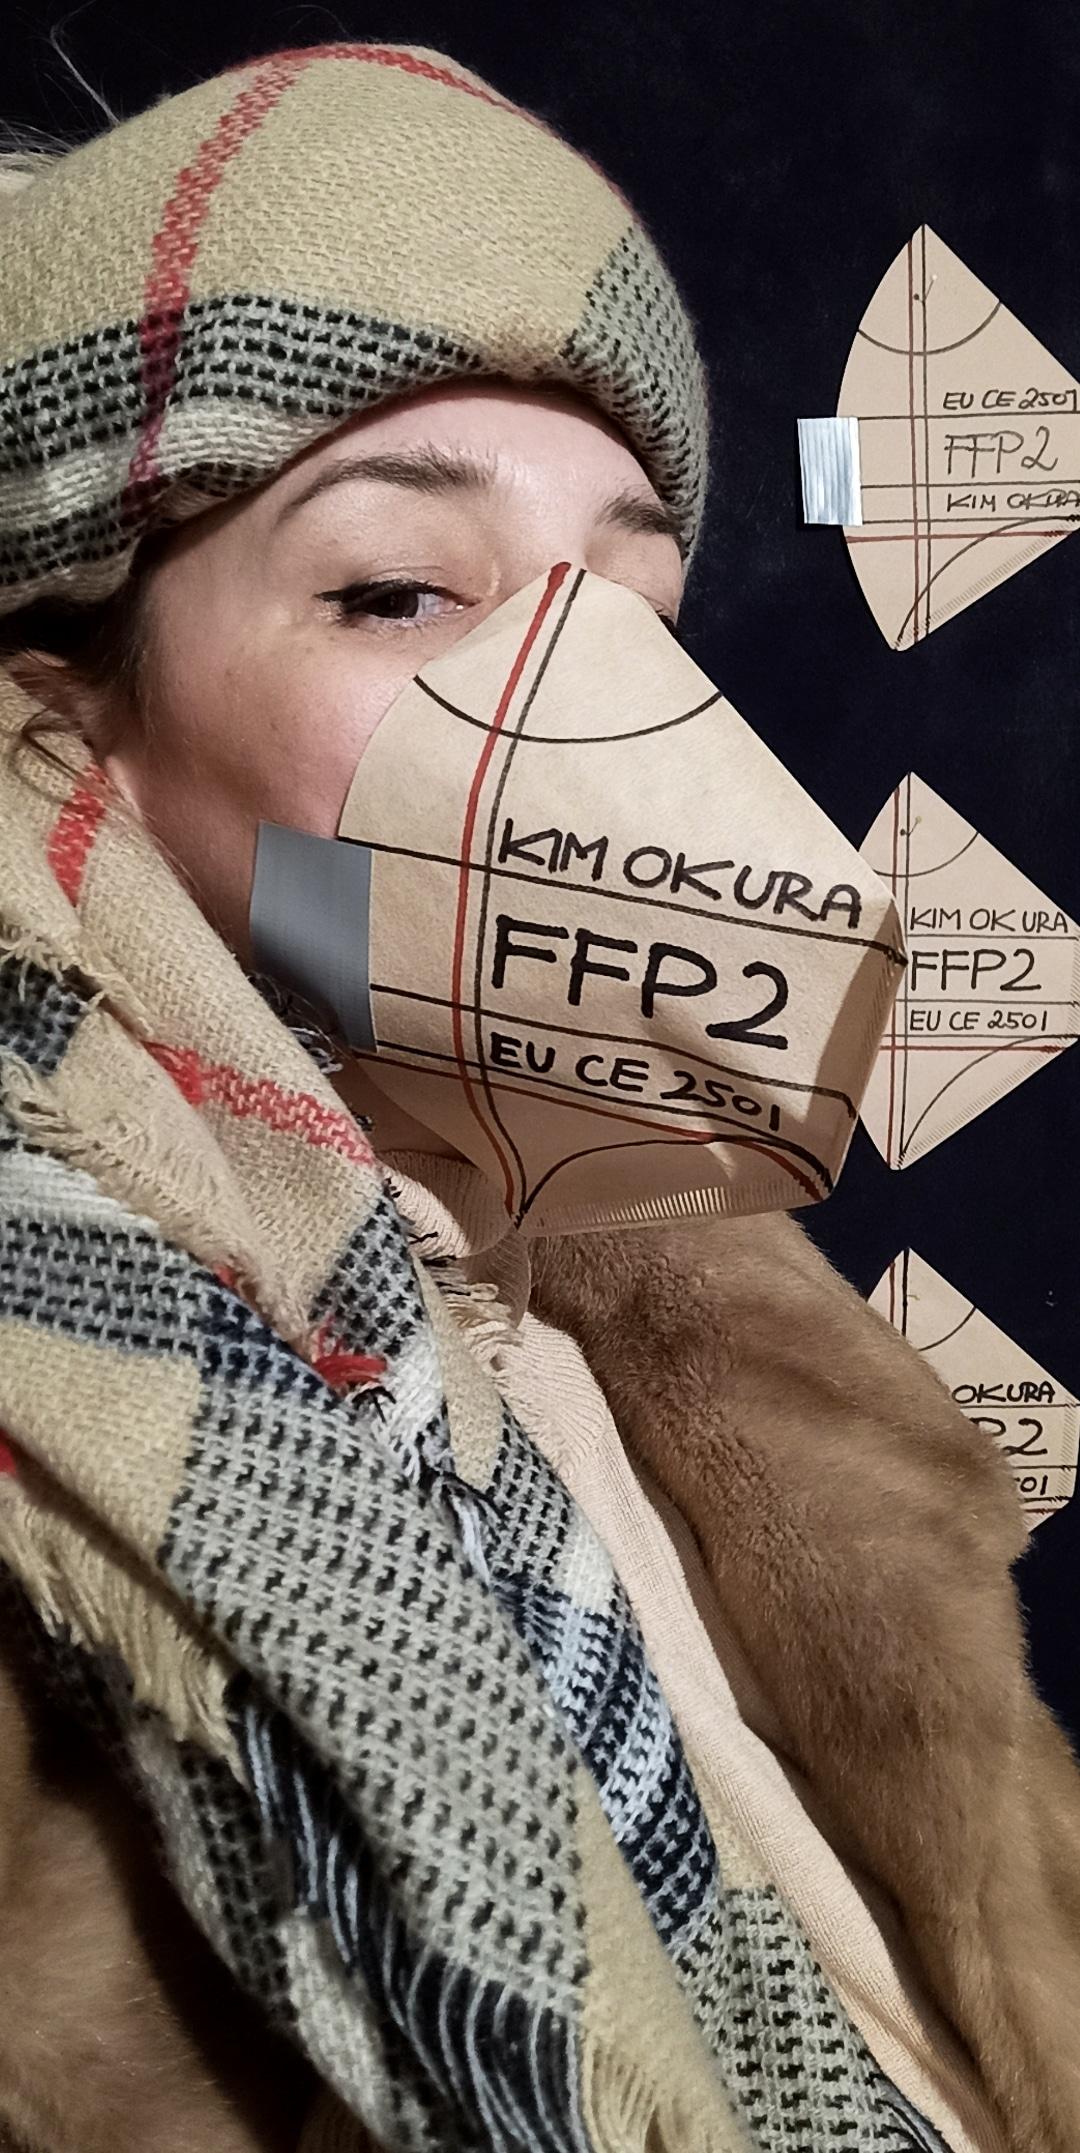 Kim Okura FFP2 Mask IG Story poster